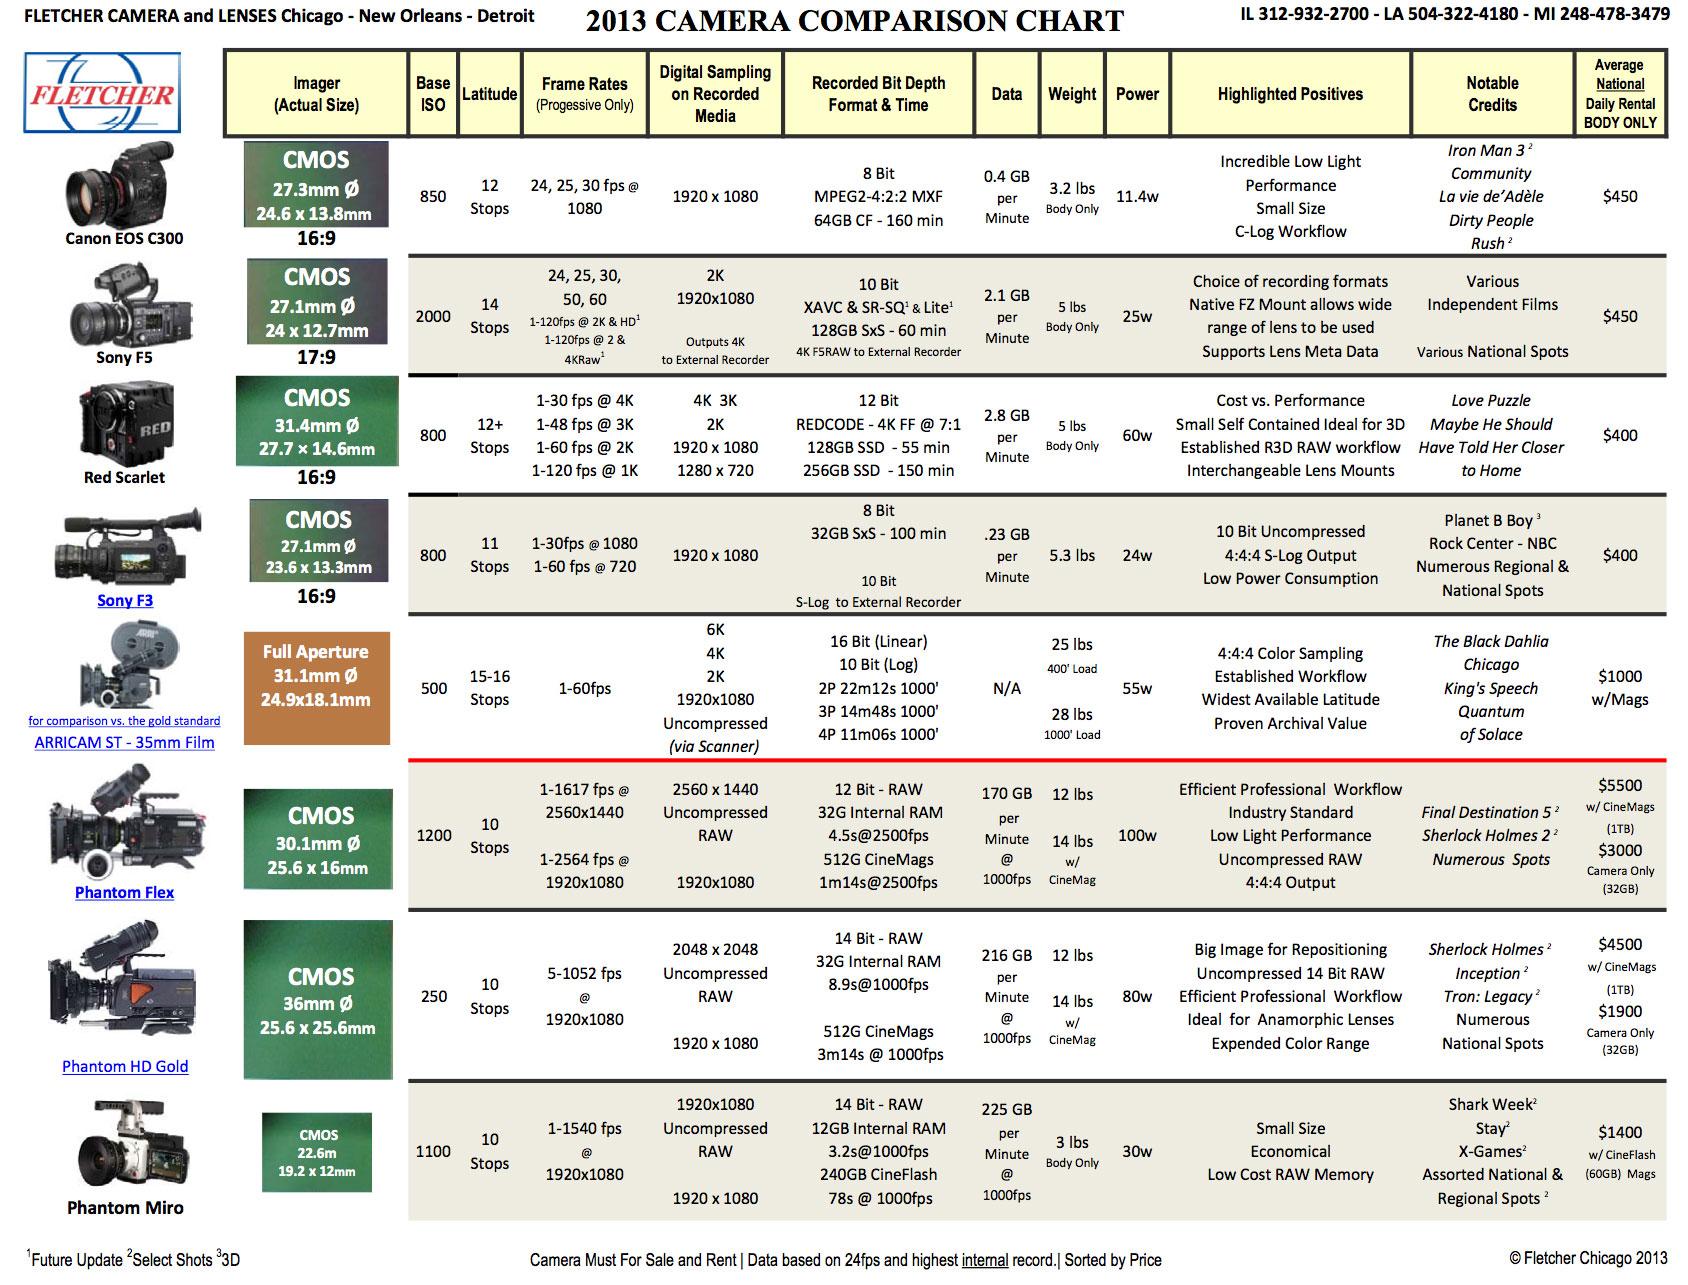 Fletcher Camera Comparison Chart 2013 | cinema5D